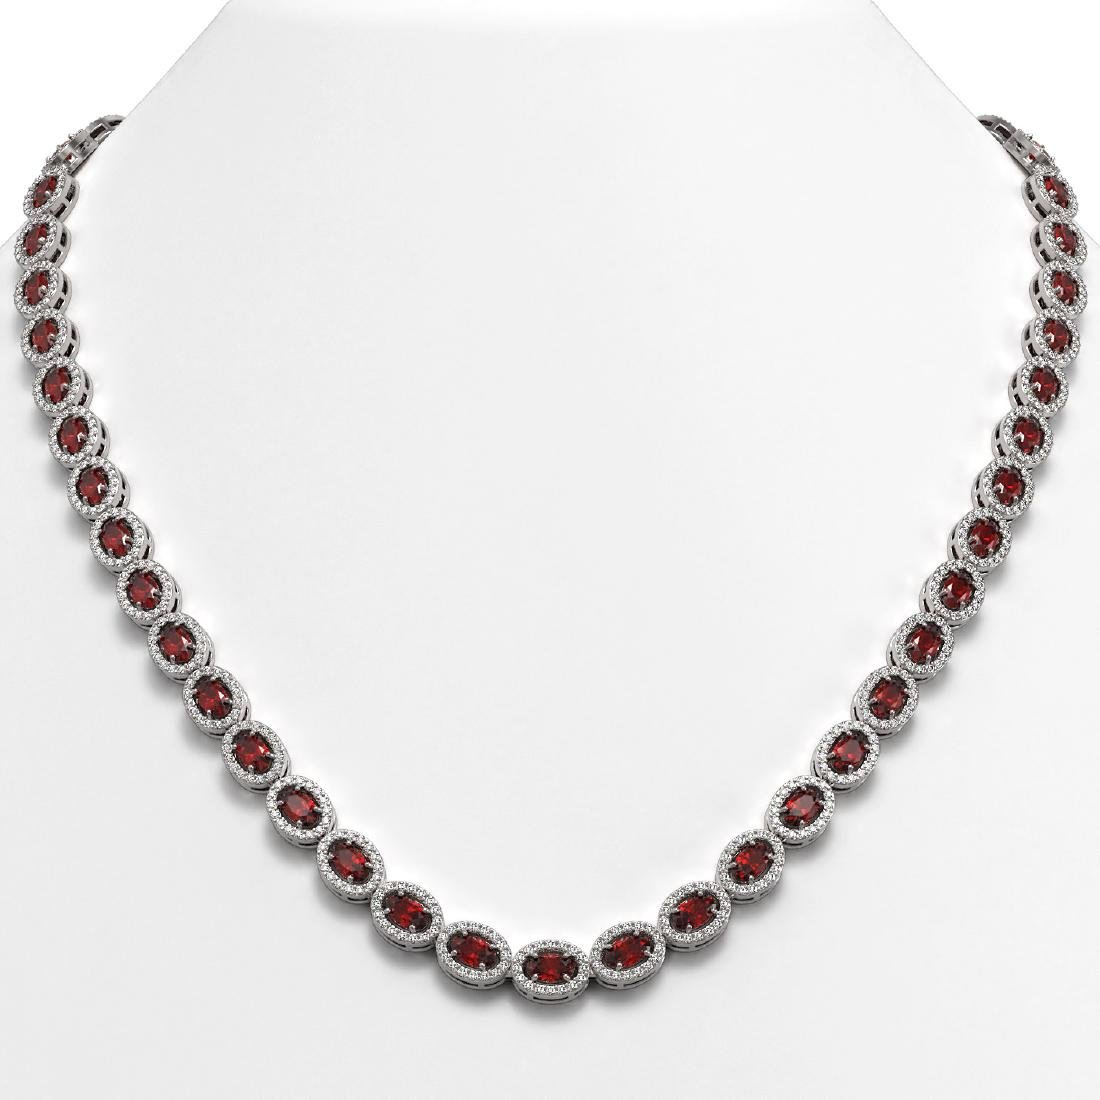 21.04 CTW Garnet & Diamond Halo Necklace 10K White Gold